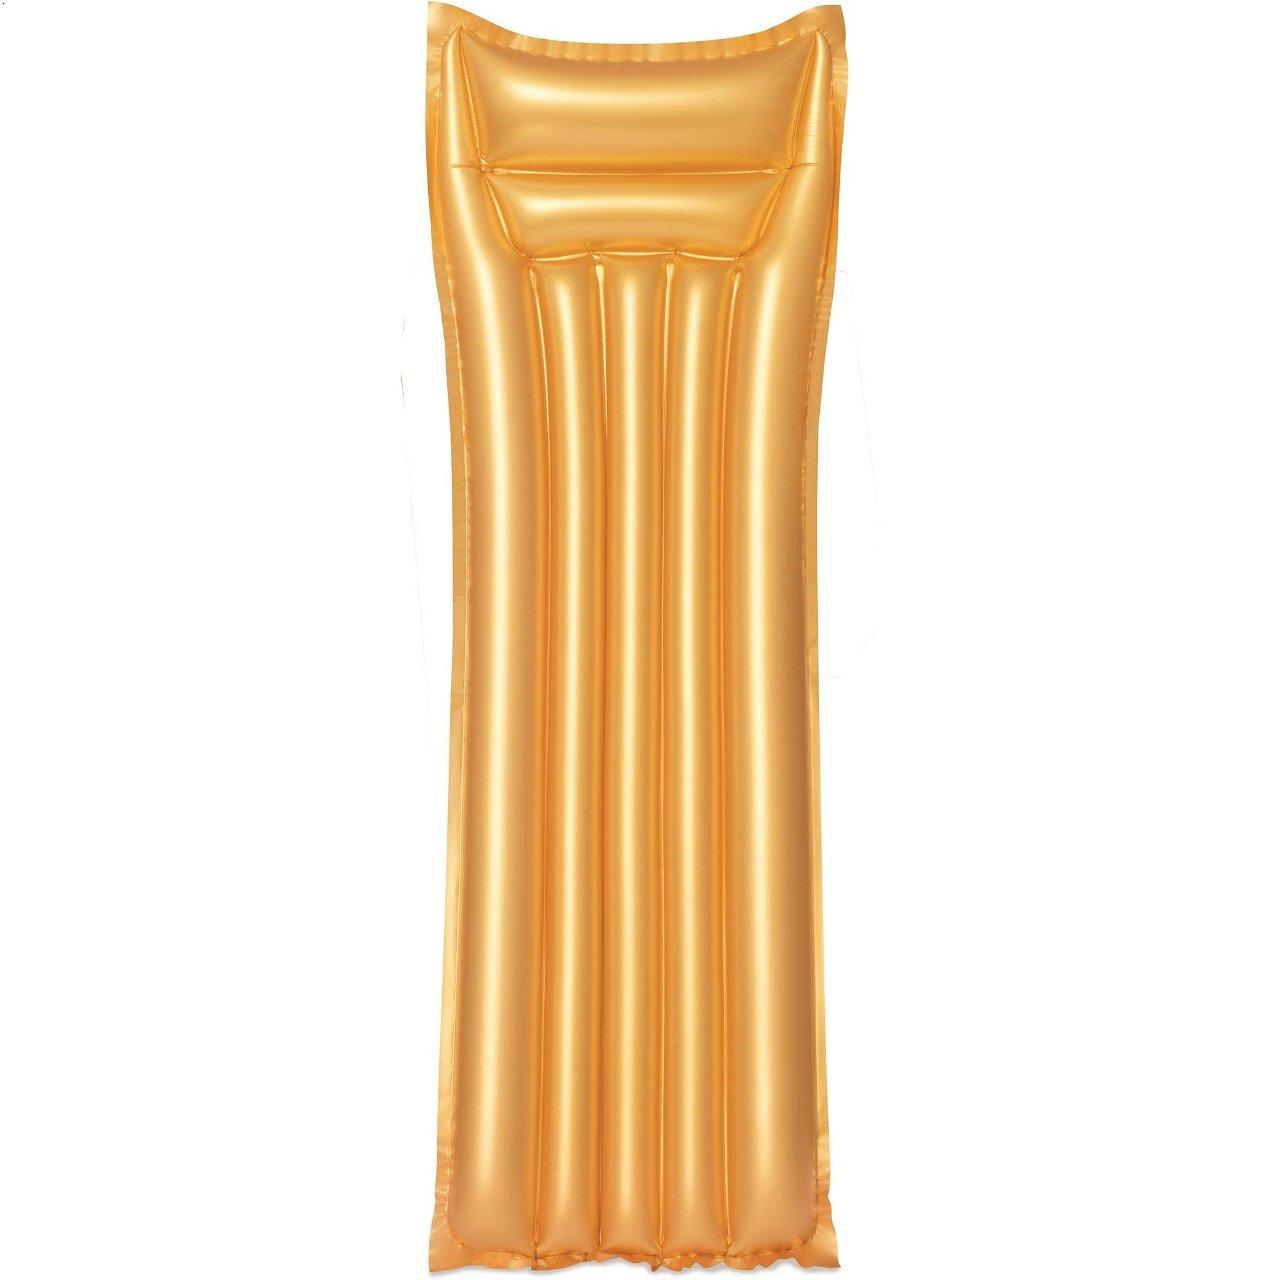 Bestway 44044 Gold Swim Mat 183x69 cm